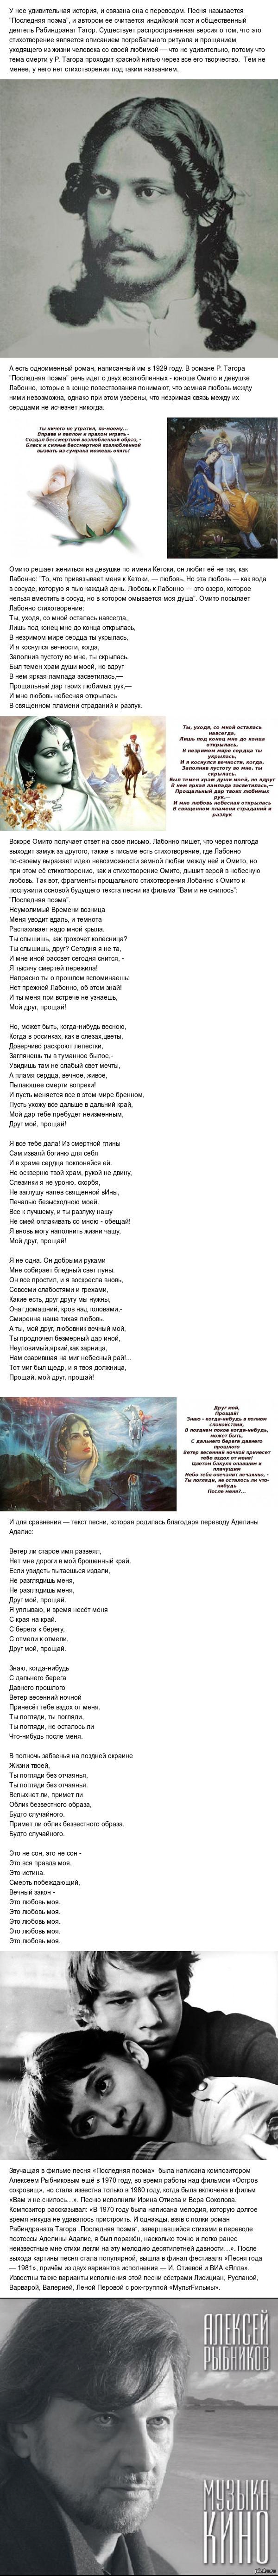 https://cs6.pikabu.ru/post_img/2015/07/12/10/1436722626_1594295906.jpg